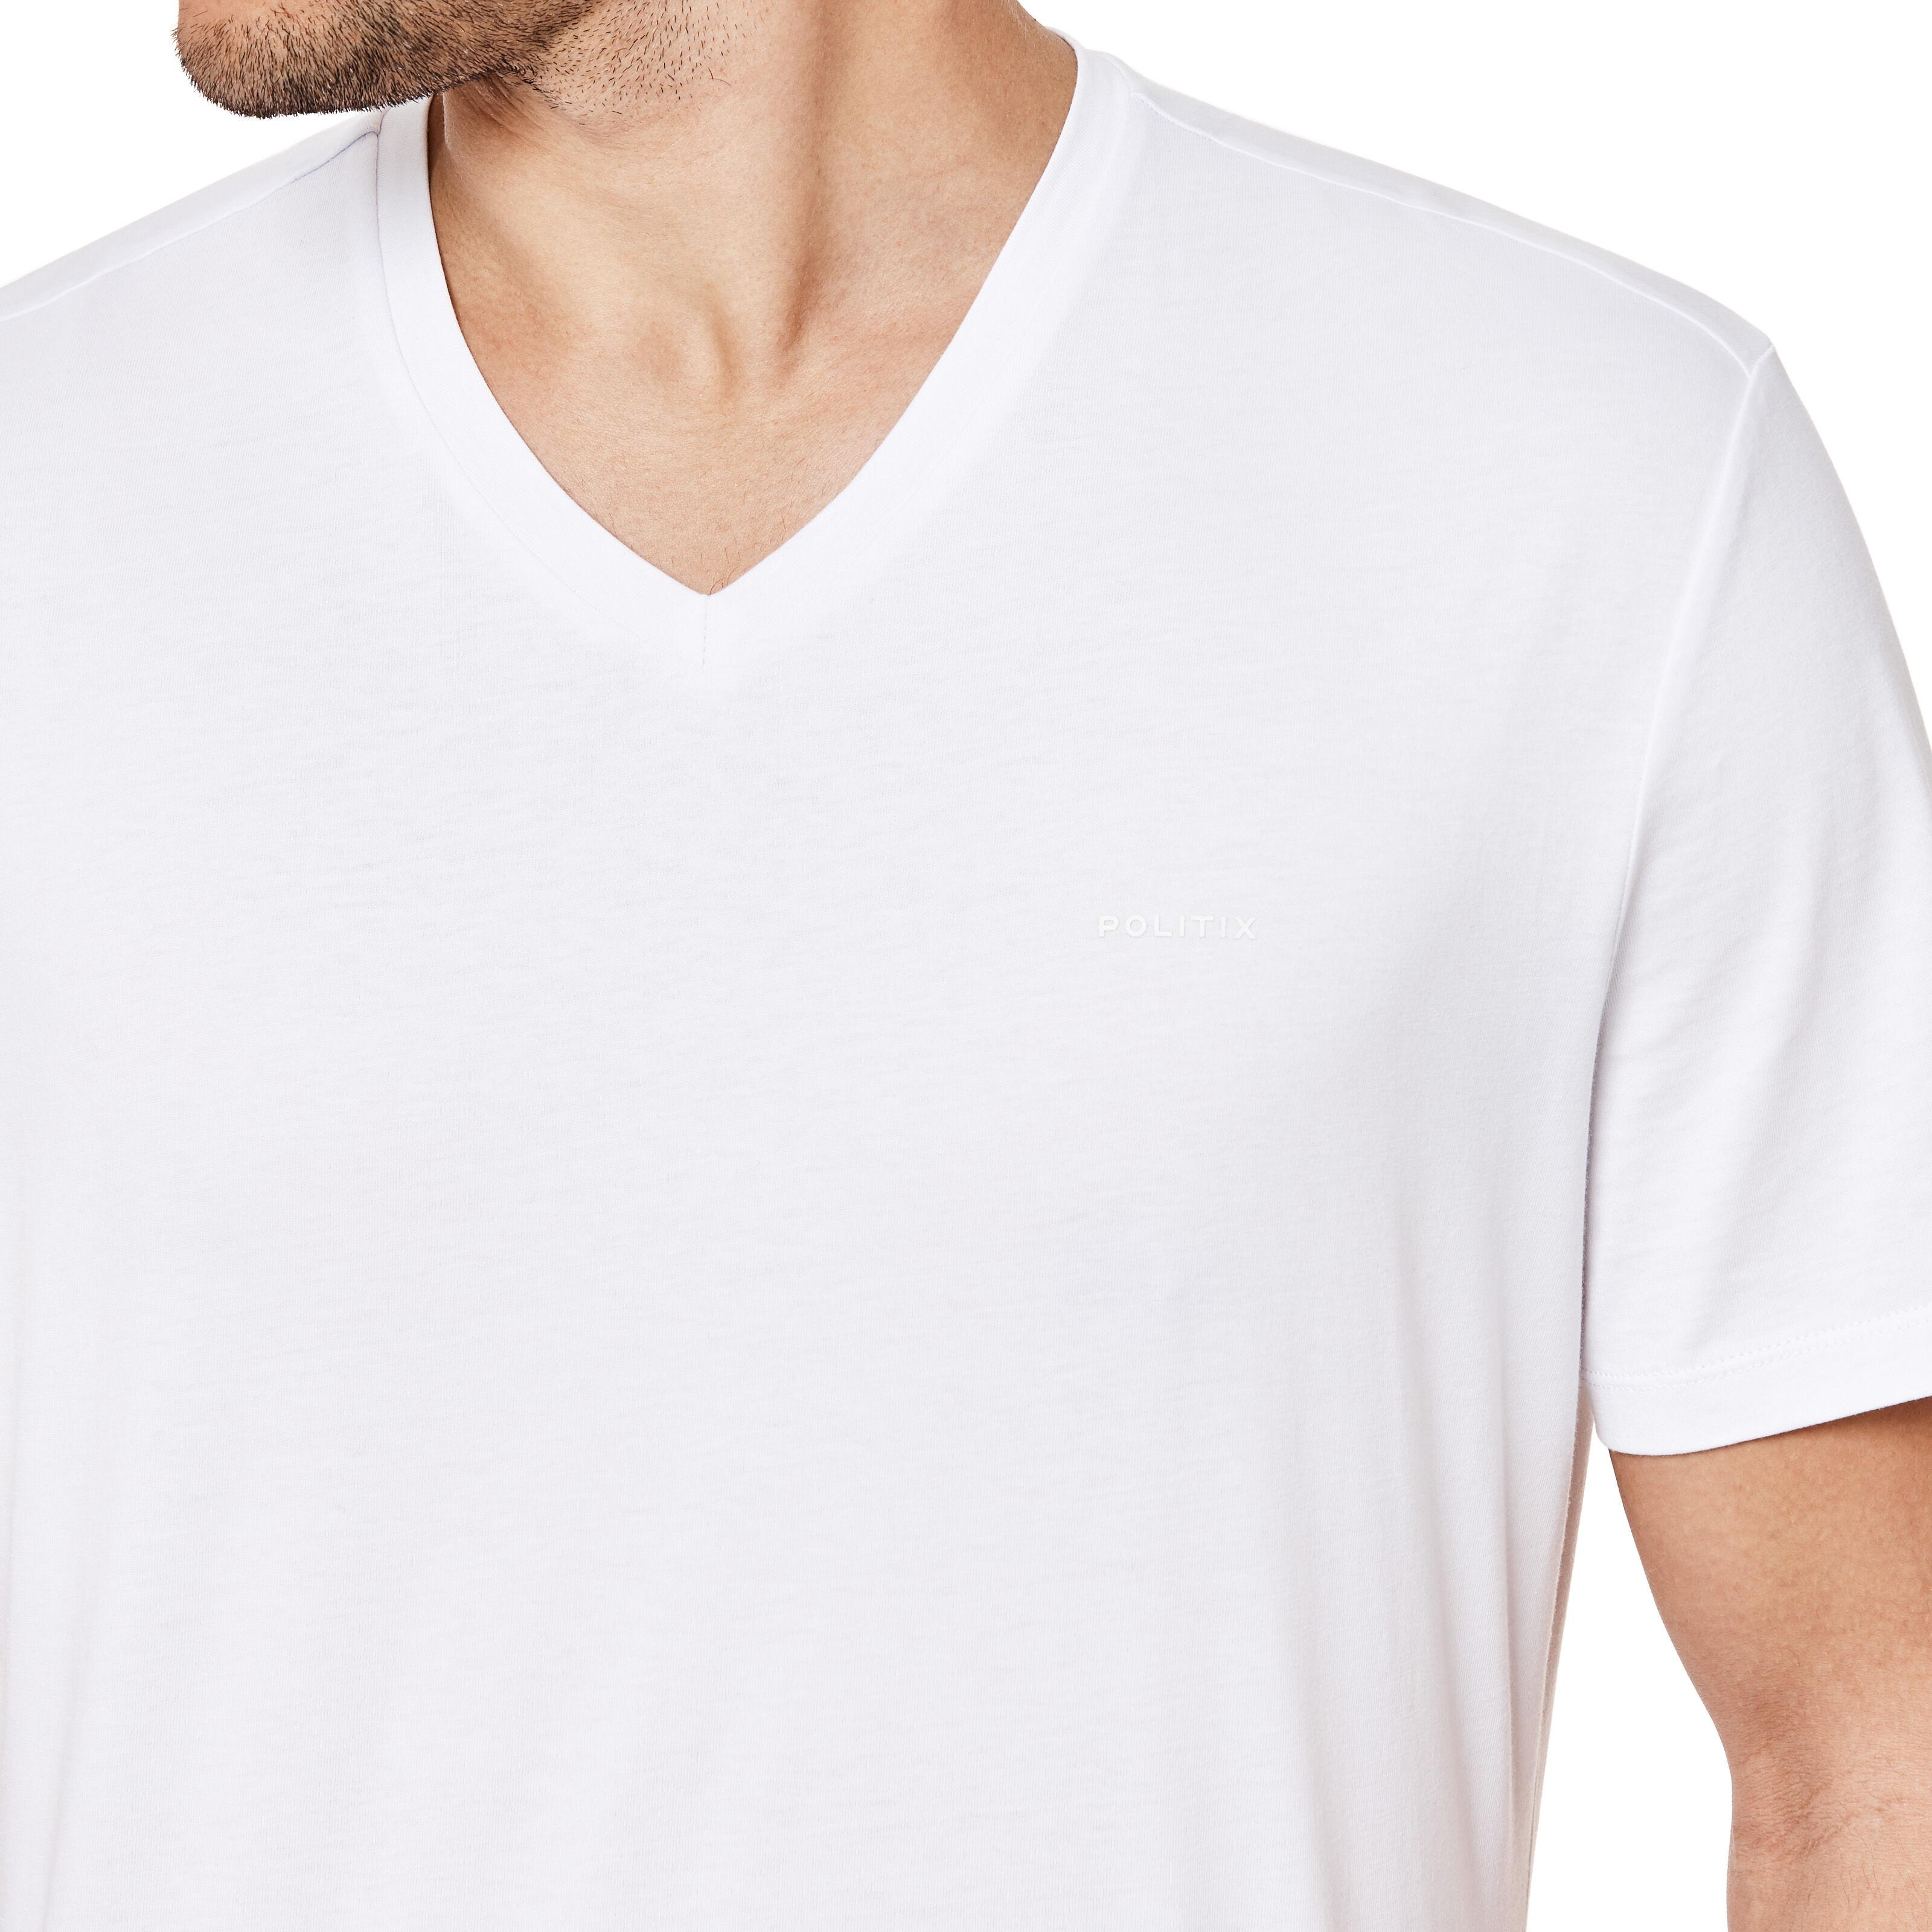 plain white t shirt nz